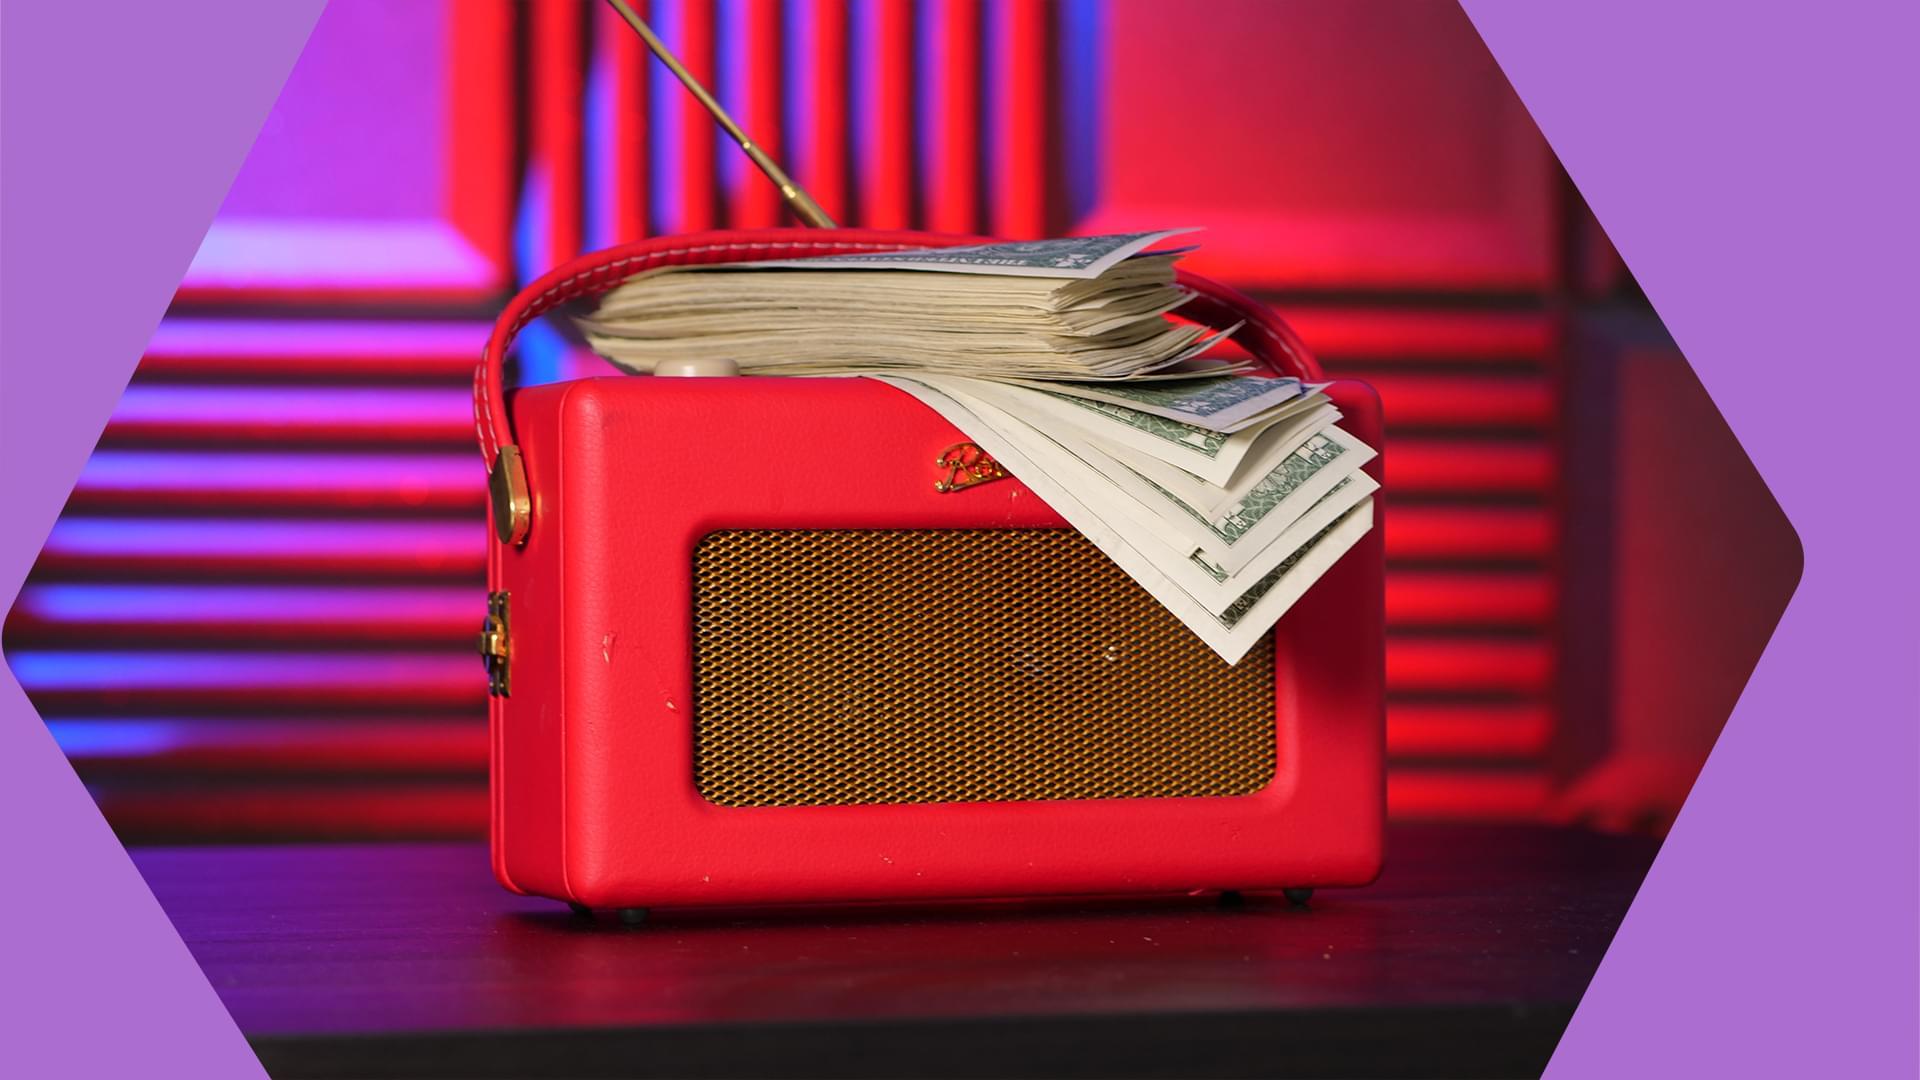 The Cost of Broadcasting DAB Radio Header